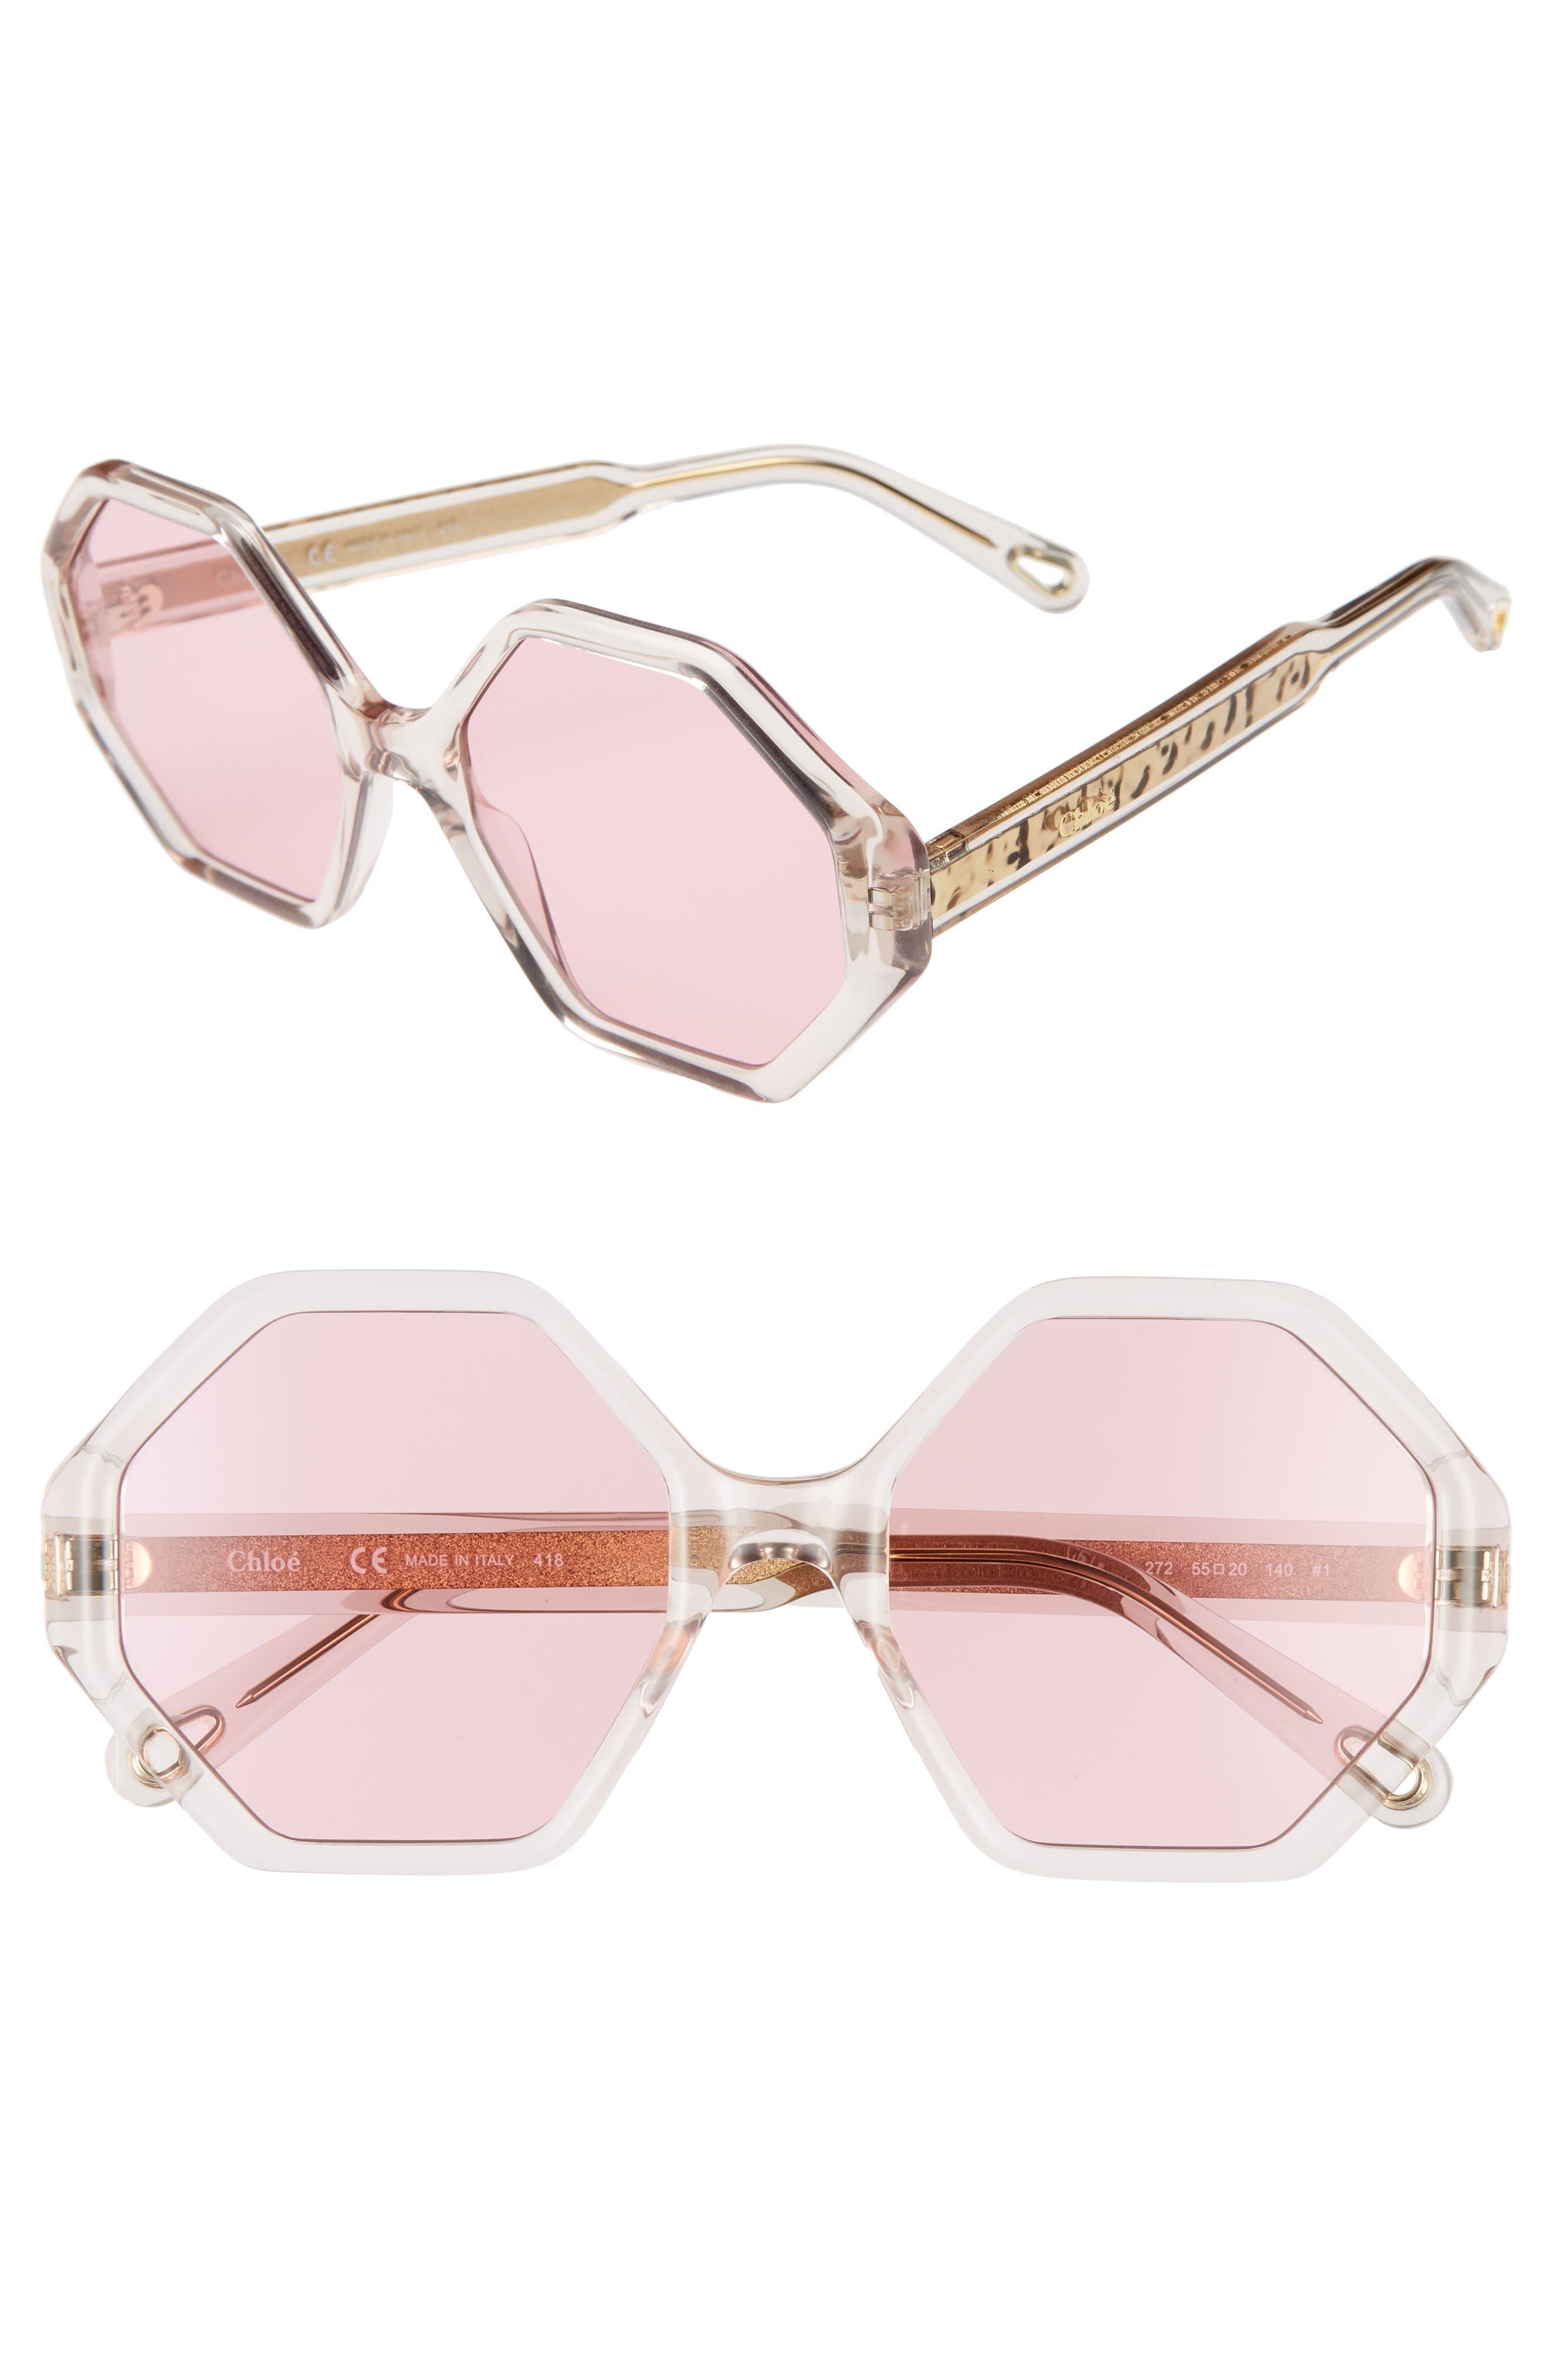 623c5a5f Chloé Sunglasses for Women | Nordstrom